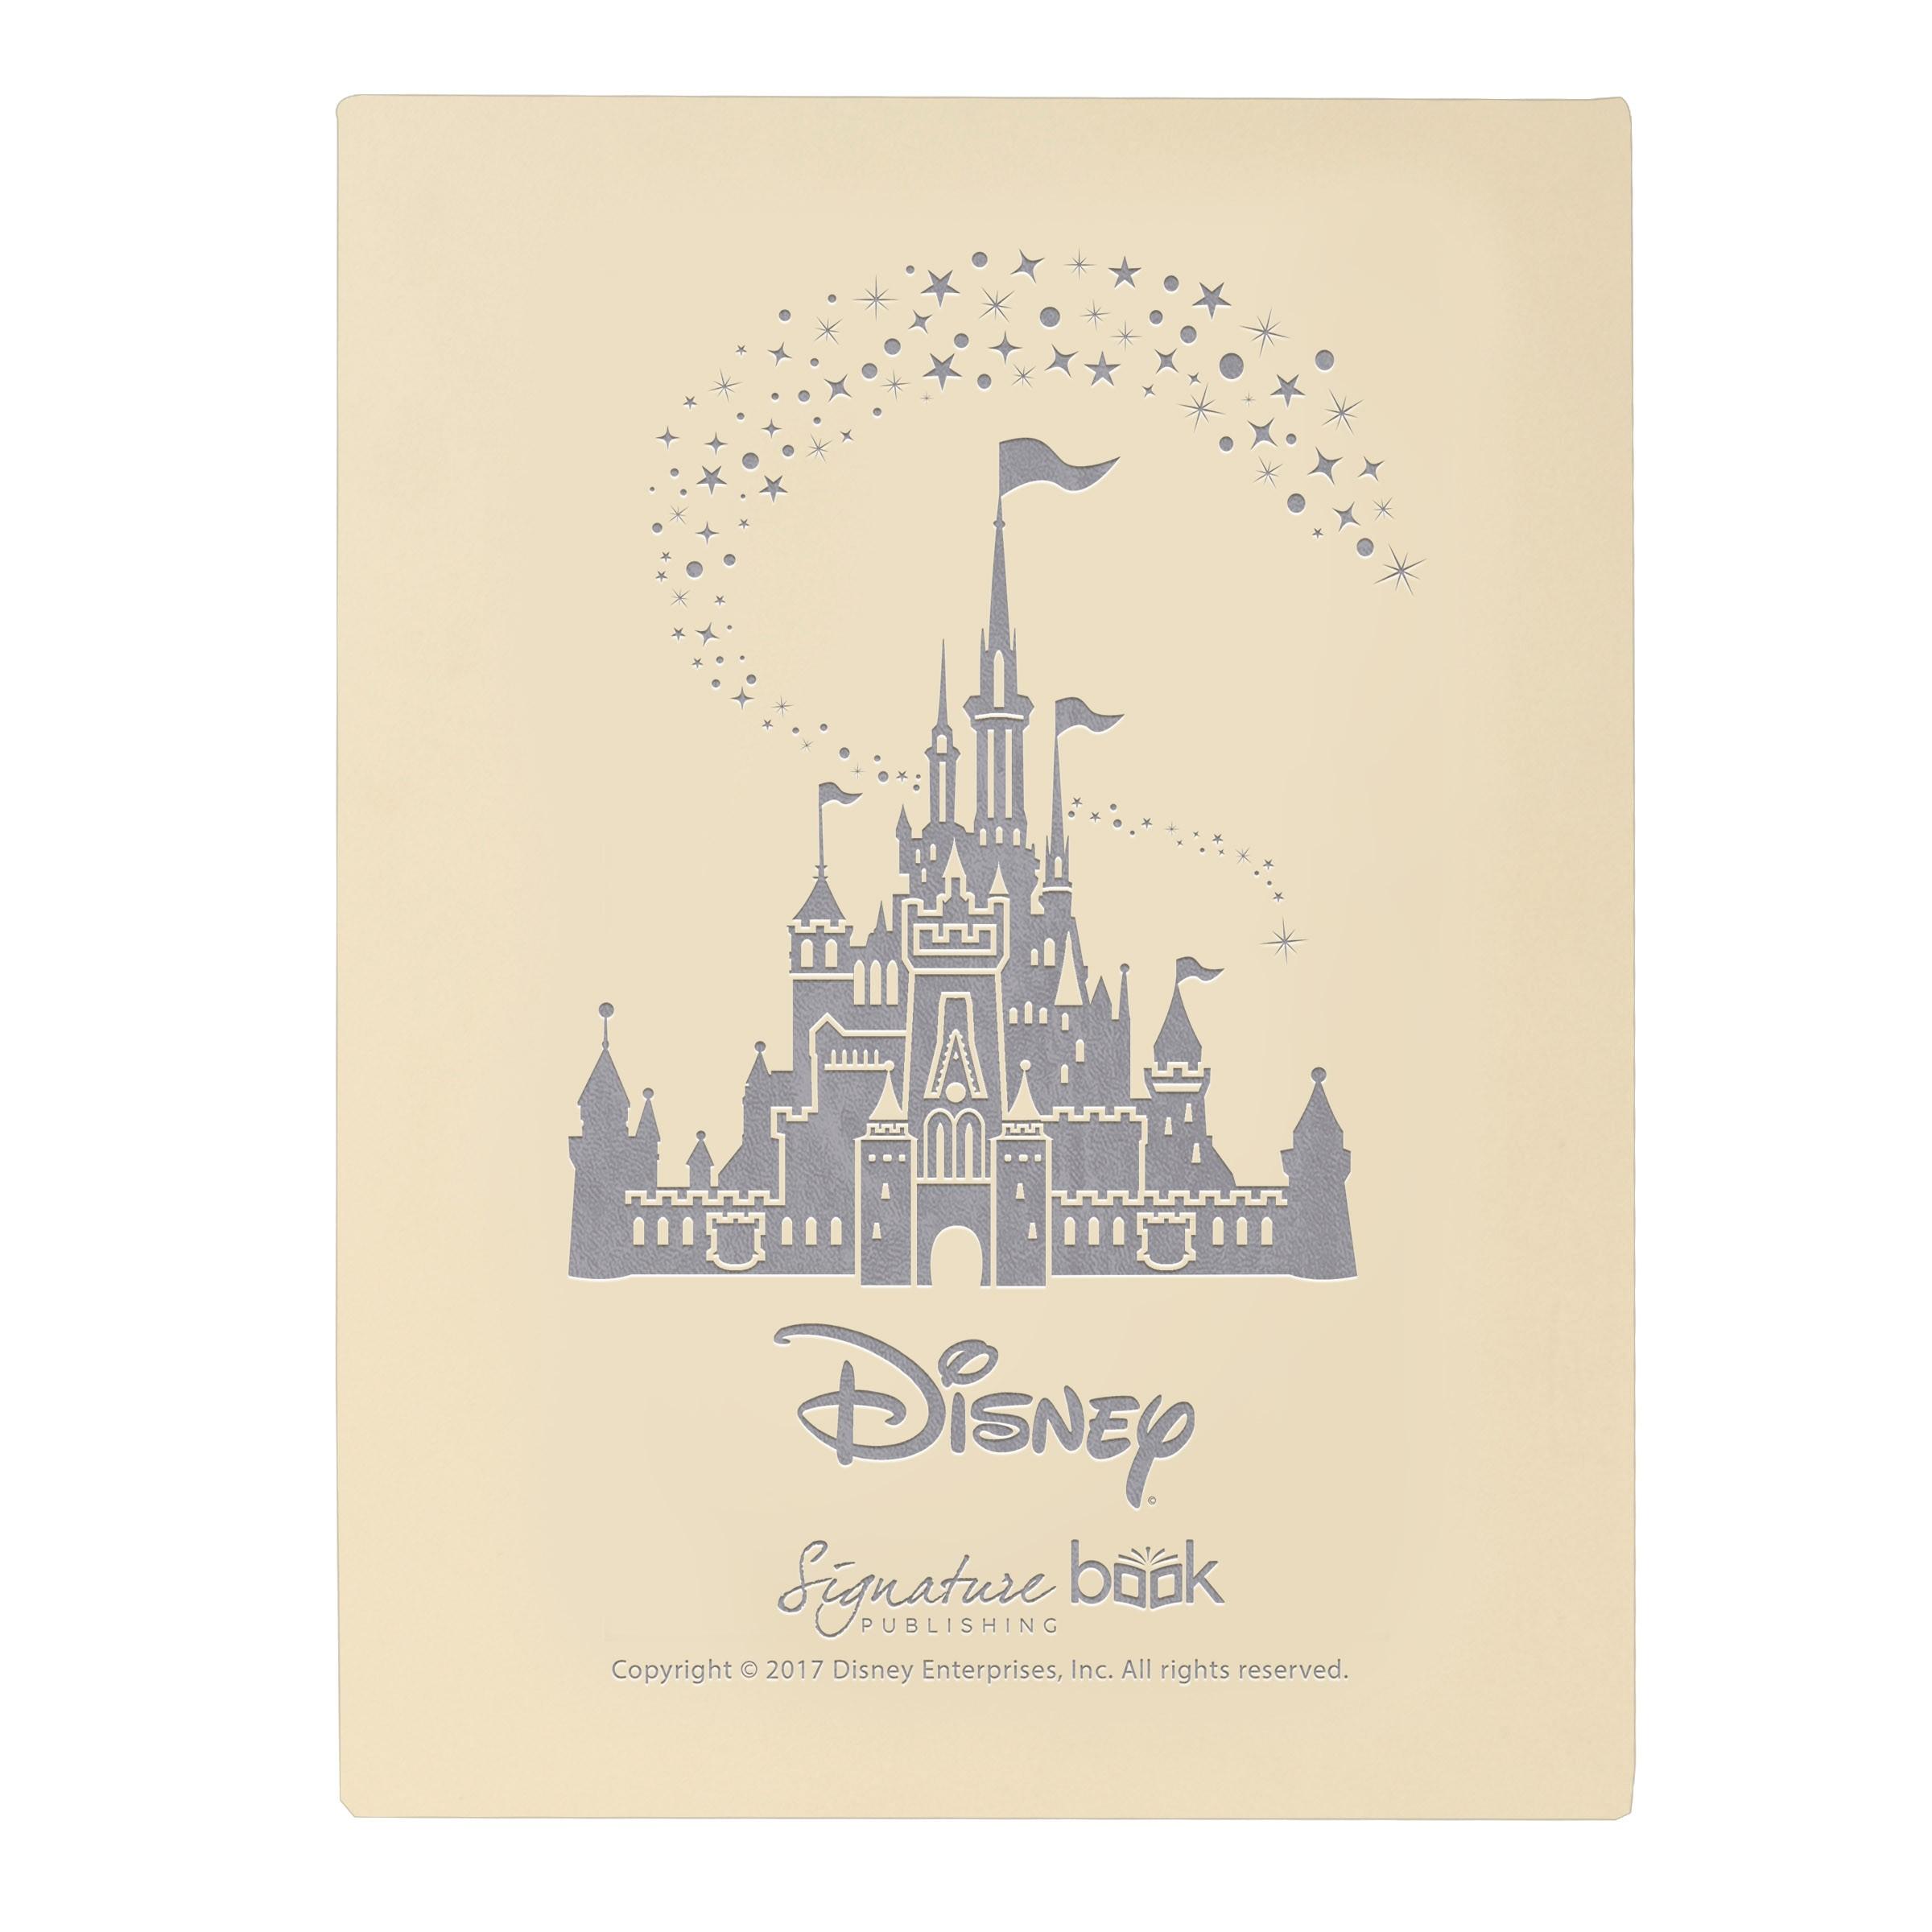 Personalized Disney Moana Storybook